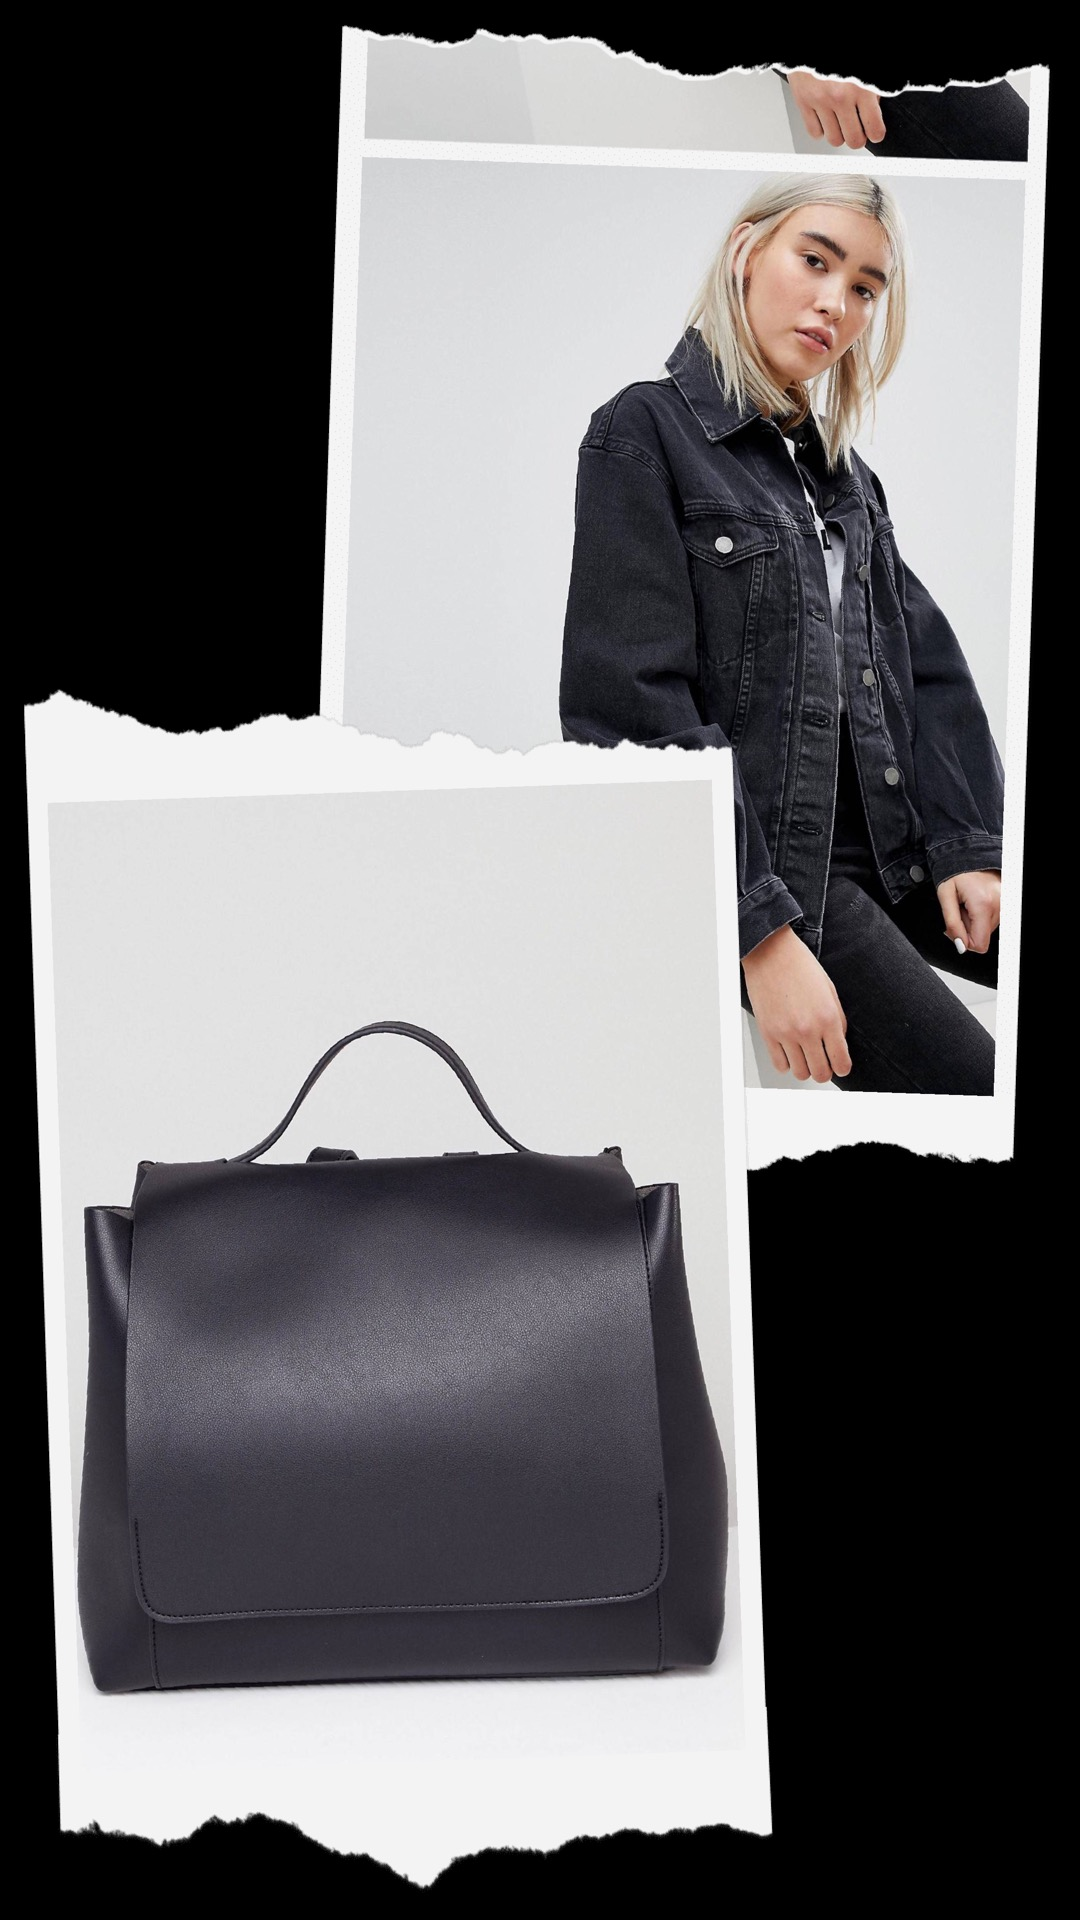 - ASOS:ASOS DESIGN denim girlfriend jacket in washed black $64.00ASOS DESIGN large minimal backpack$30.00